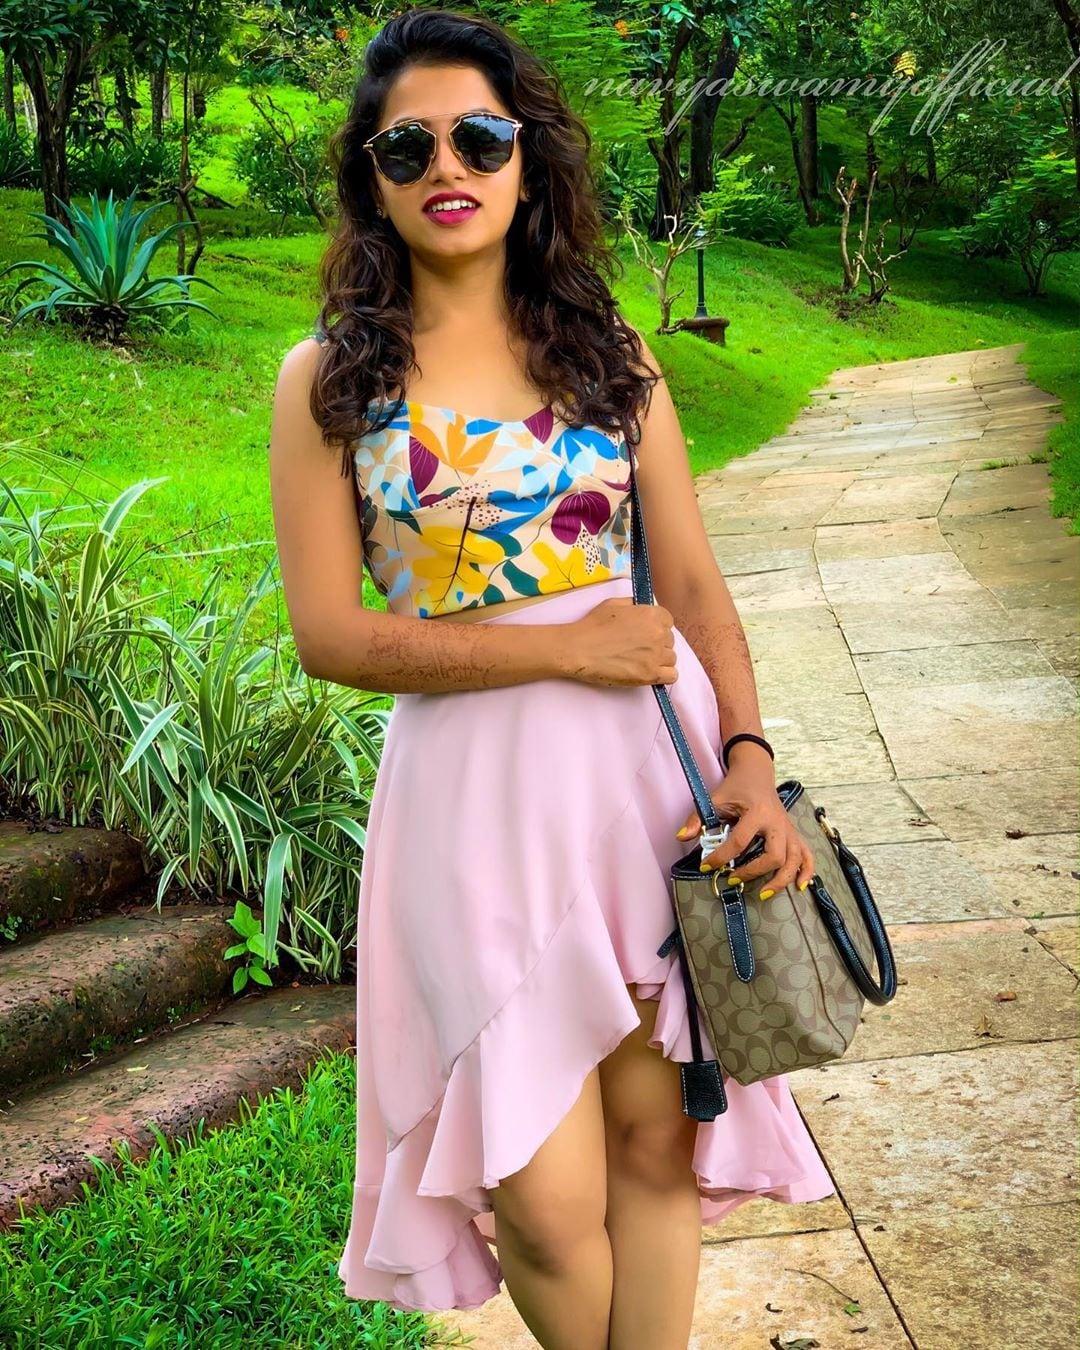 Navya Swamy : నా పేరు మీనాక్షి సీరియల్ నటి నవ్య స్వామి బ్యూటీఫుల్ పిక్స్.. Photo : Instagram